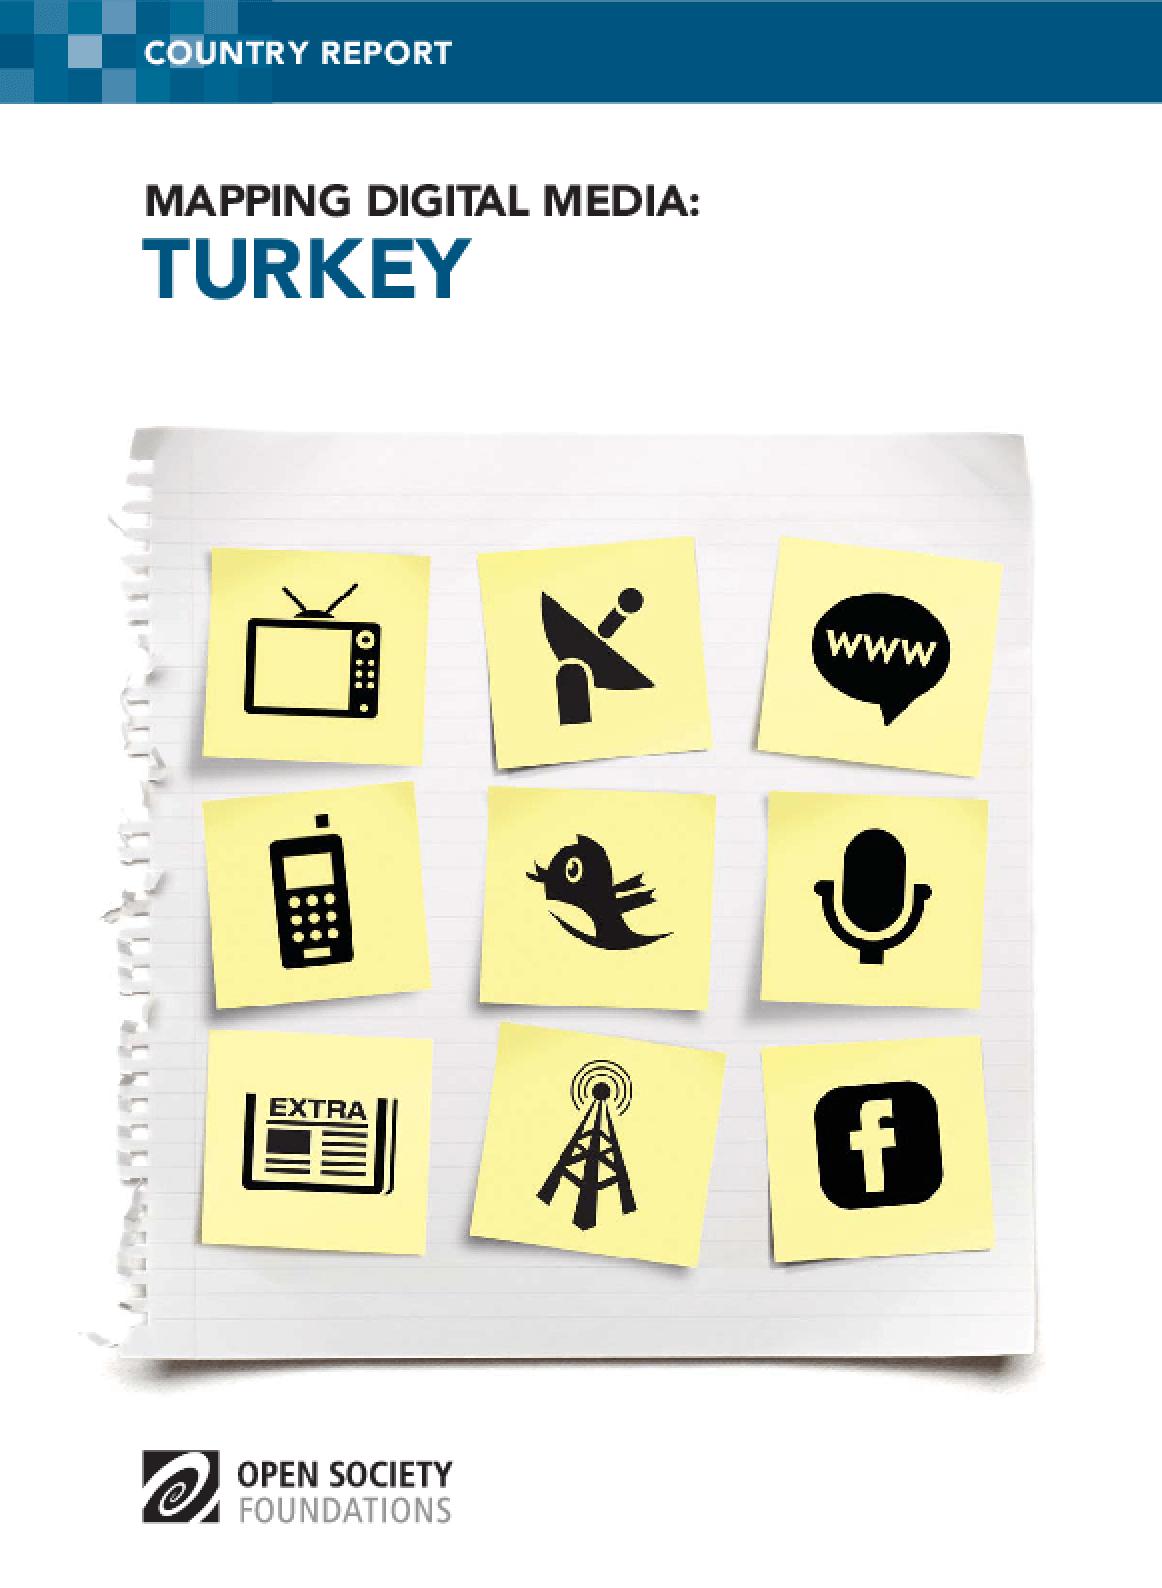 Mapping Digital Media: Turkey